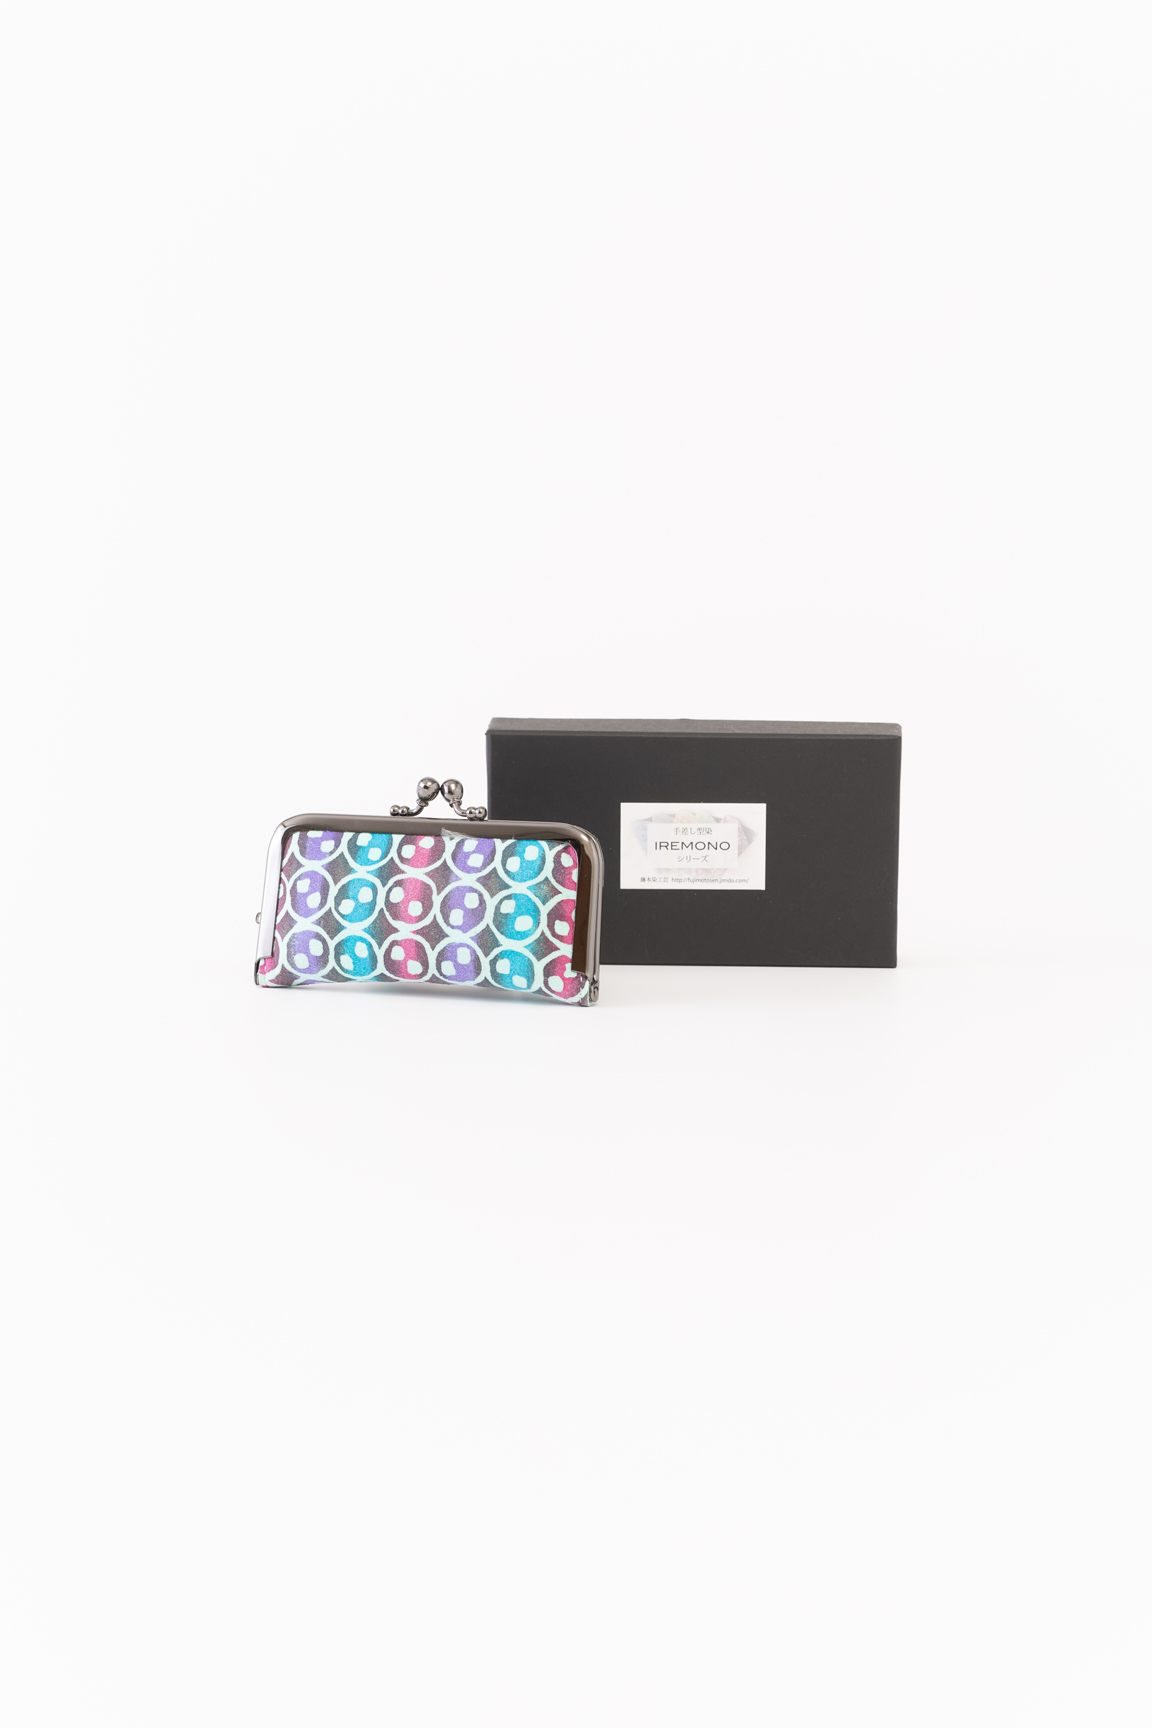 Name stamp case(blue)&box